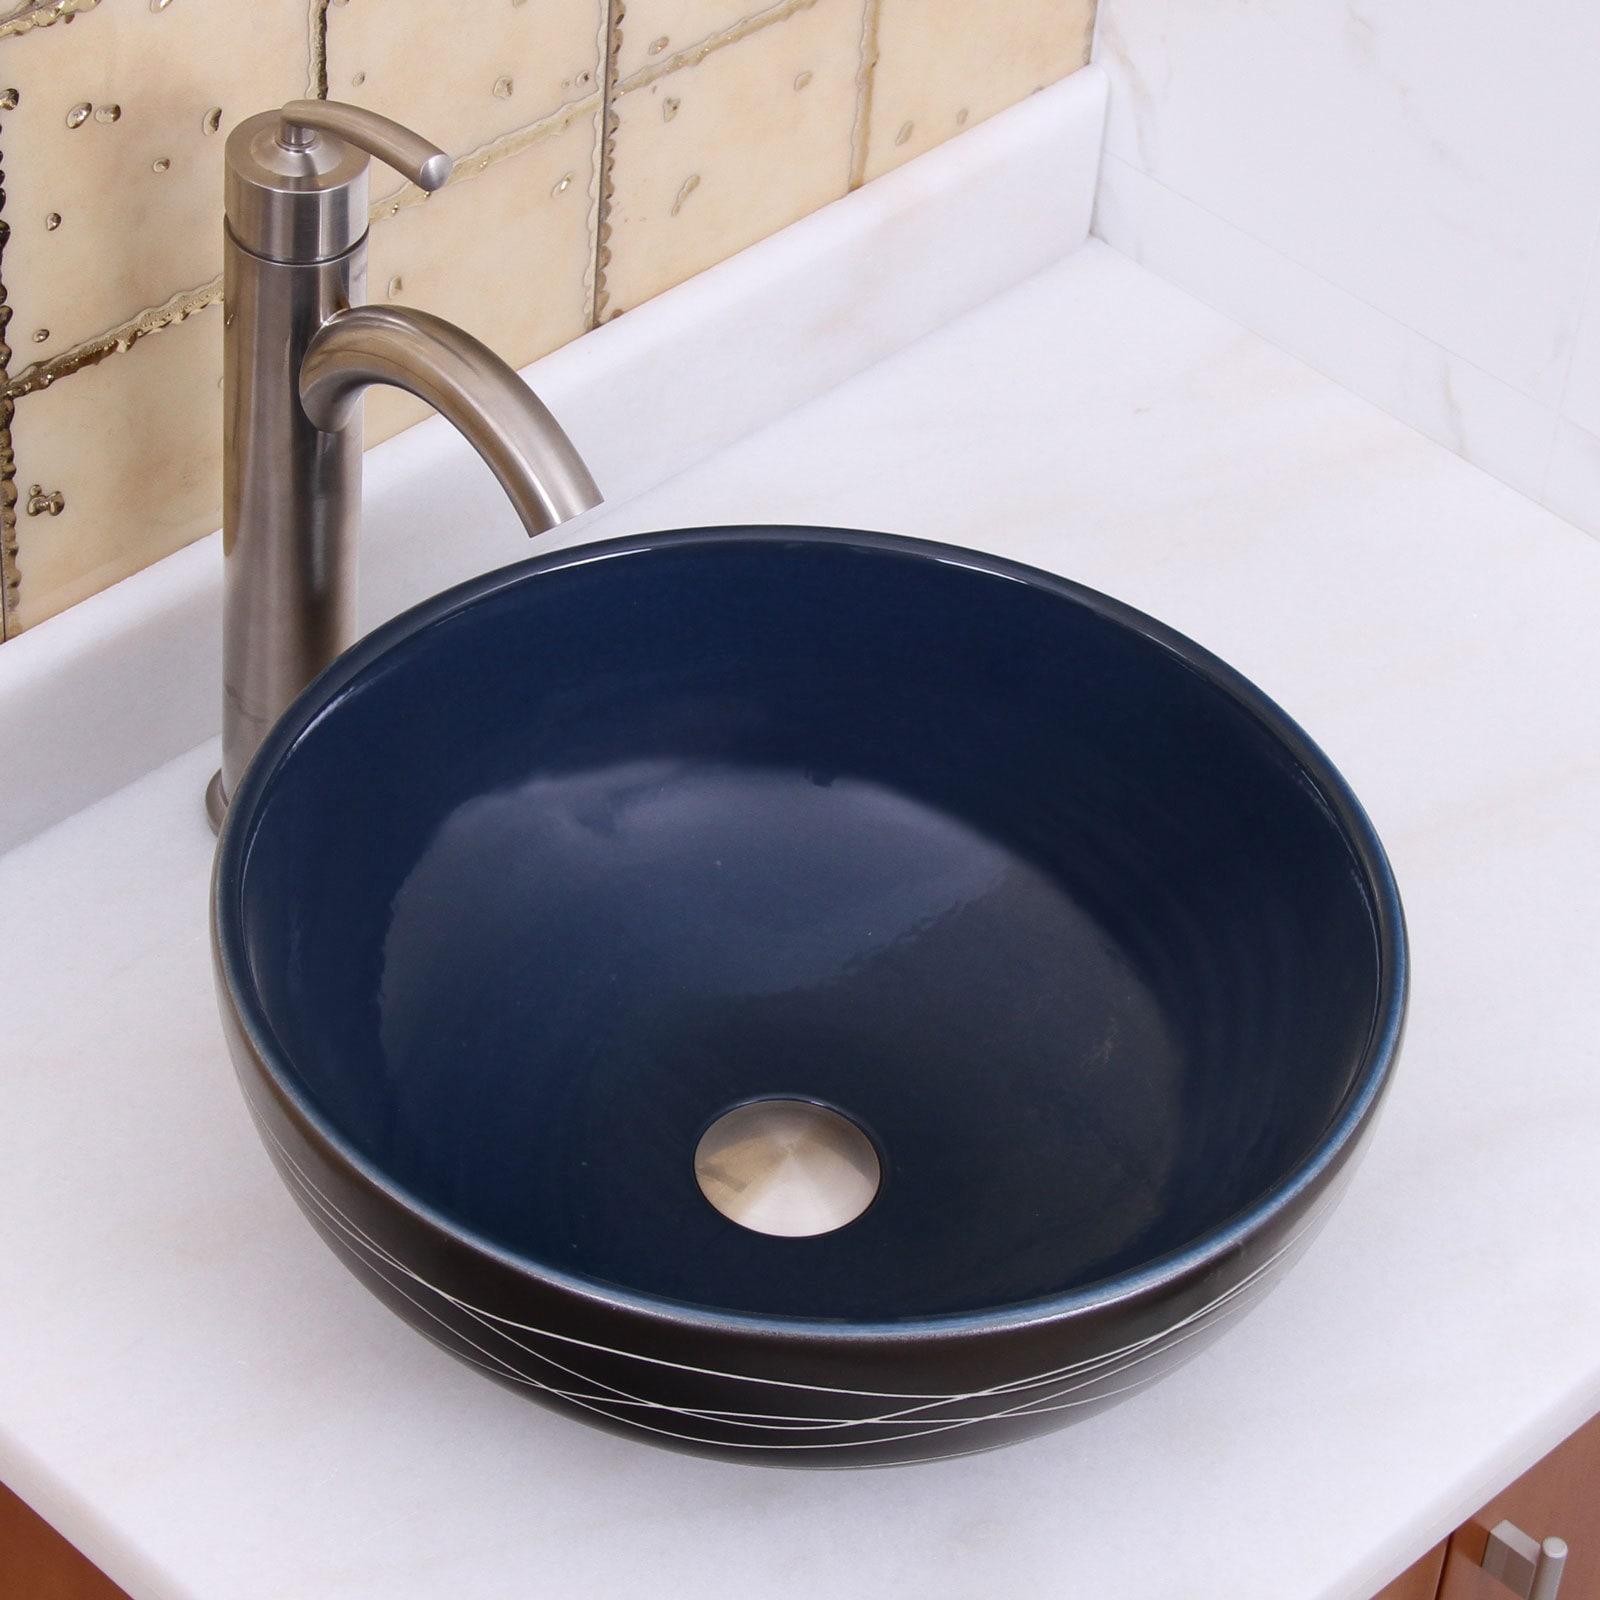 Charmant Shop ELIMAXu0027S 2021 Sapphire Glaze Porcelain Ceramic Bathroom Vessel Sink    Free Shipping Today   Overstock.com   10075292